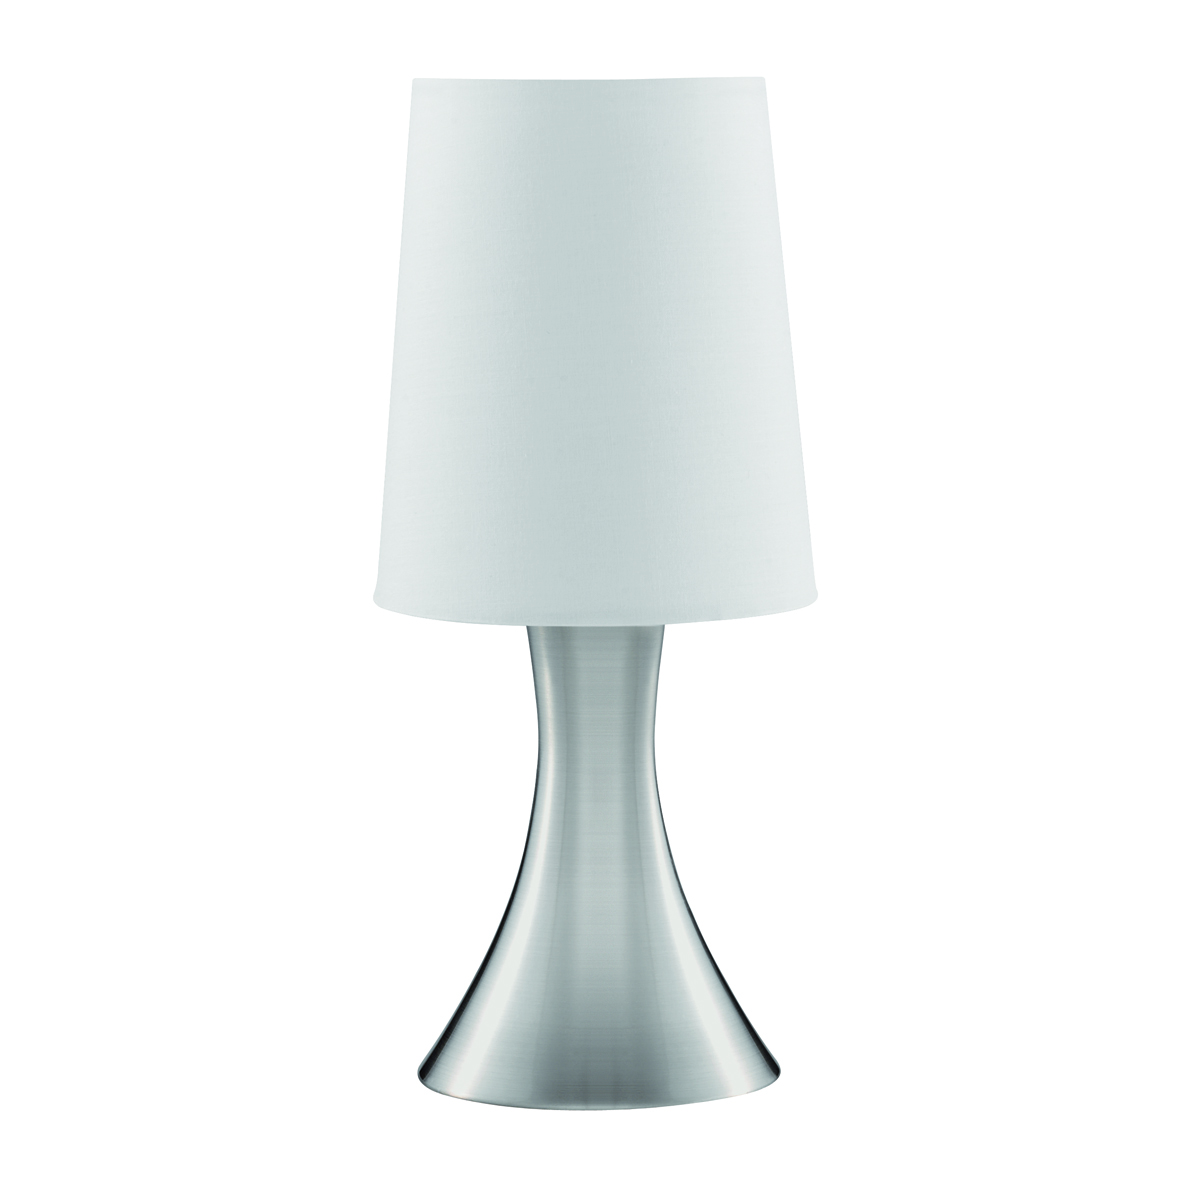 Searchlight EU3922SS TOUCH LAMPS dotyková lampička 1xE14